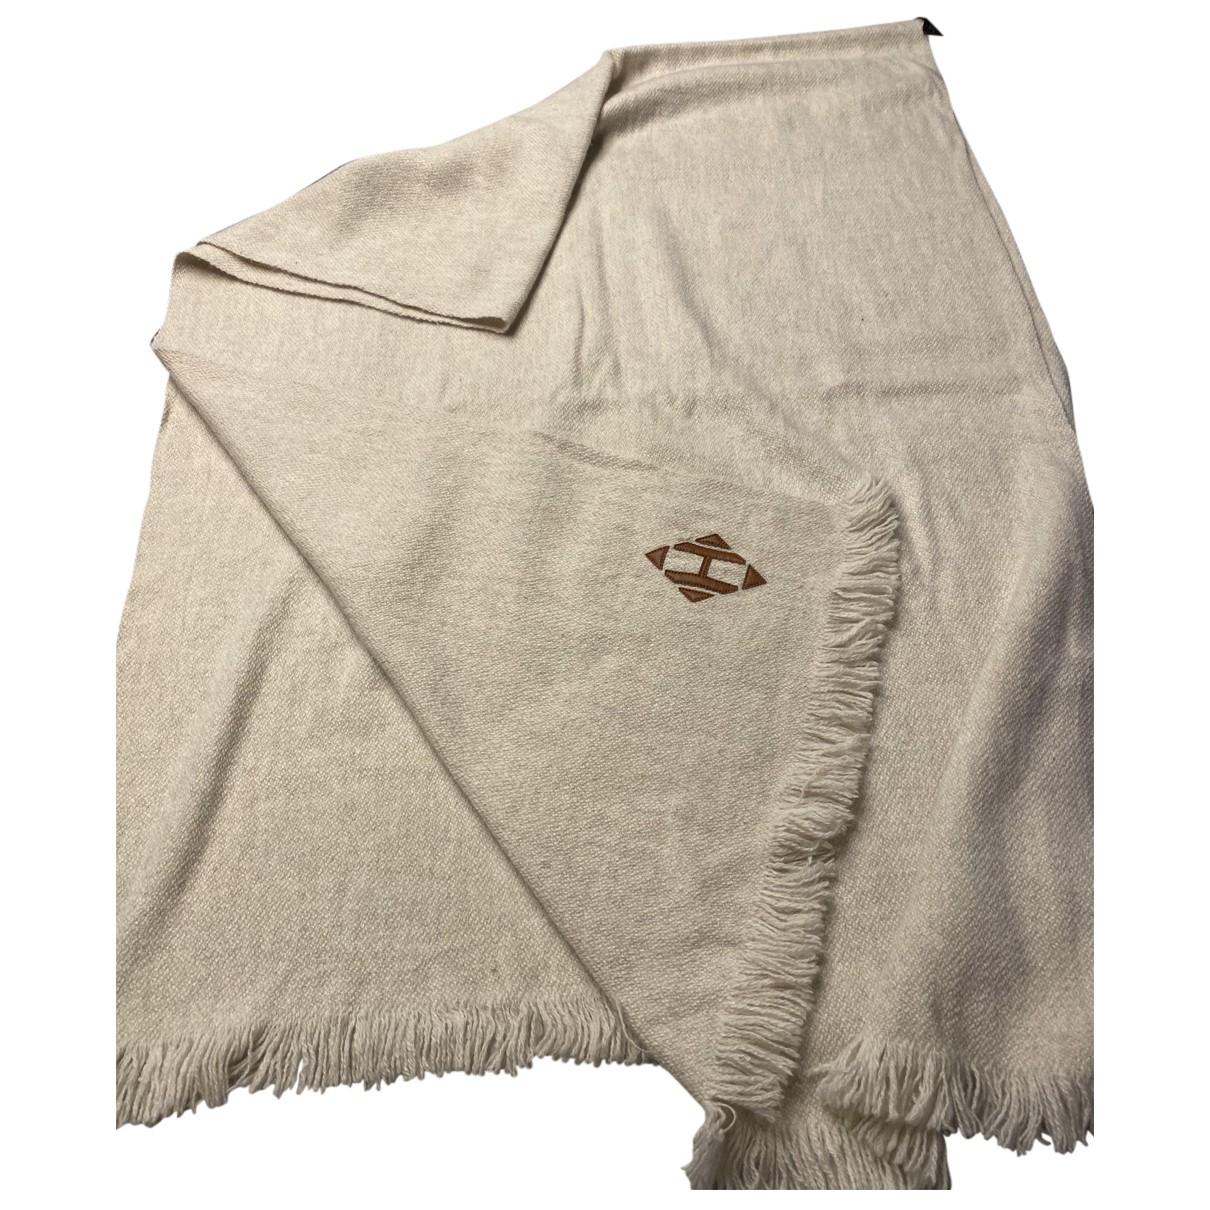 Hermes - Foulard   pour femme en laine - beige